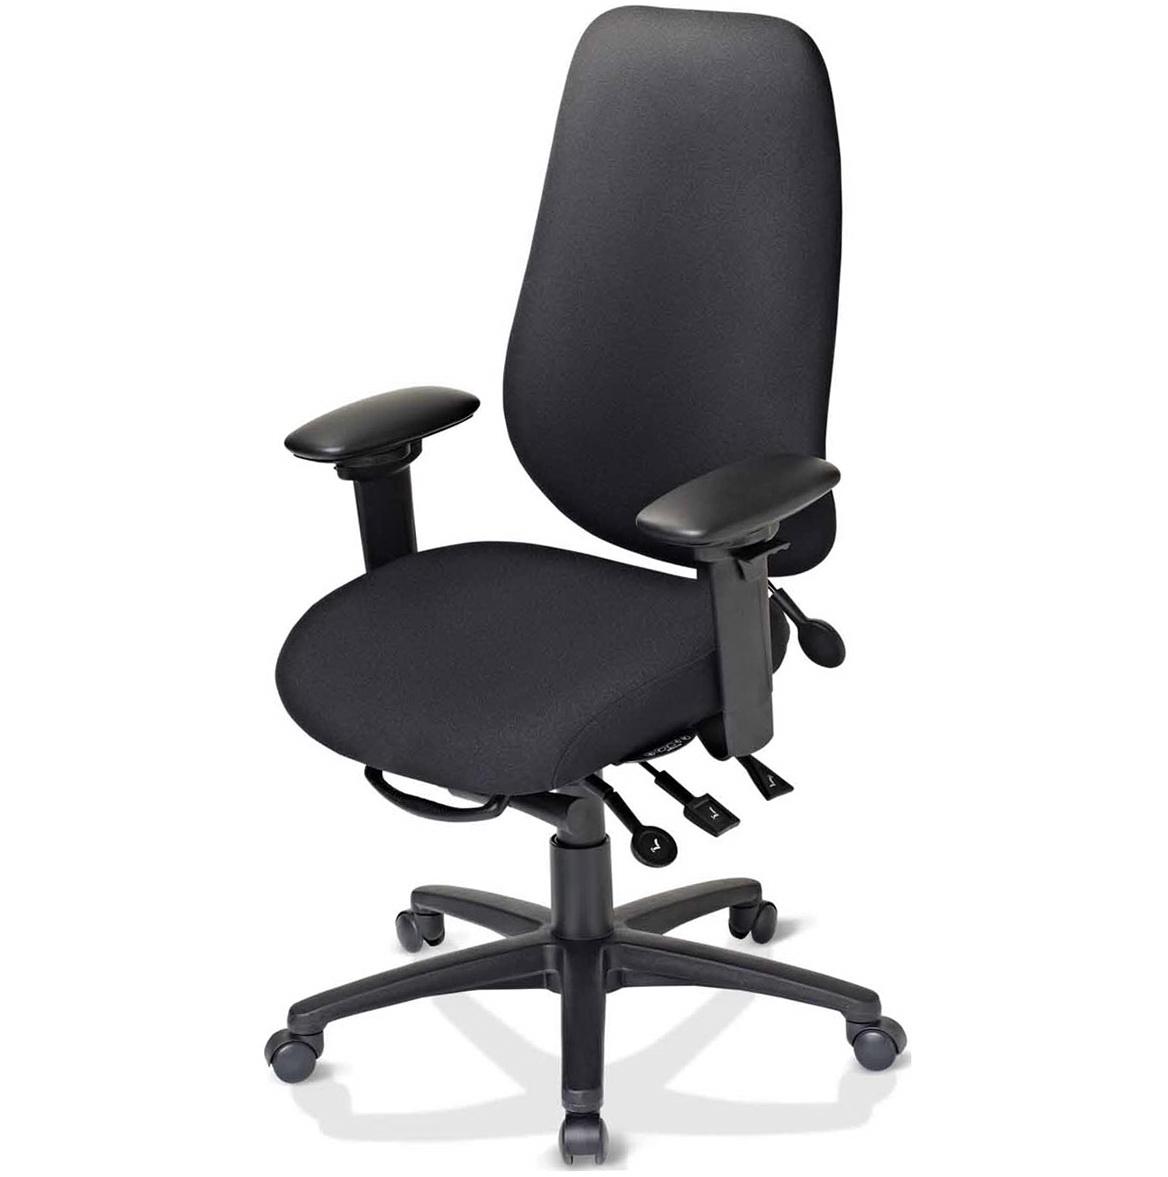 ergonomic chair cushion thinking from blues clues seat singapore home design ideas